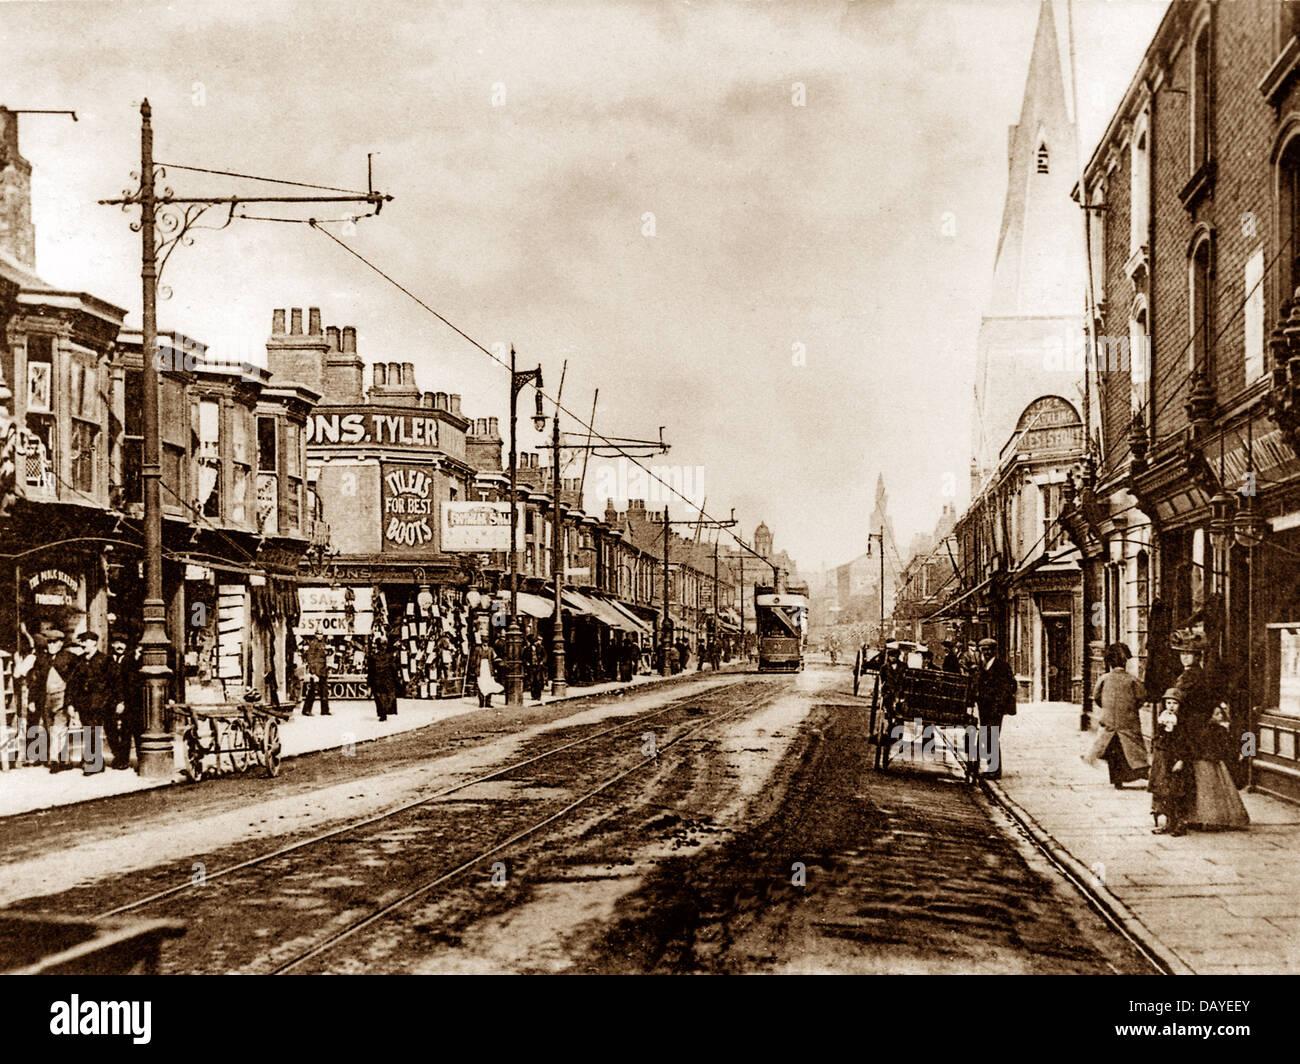 Grimsby Freeman Street early 1900s - Stock Image